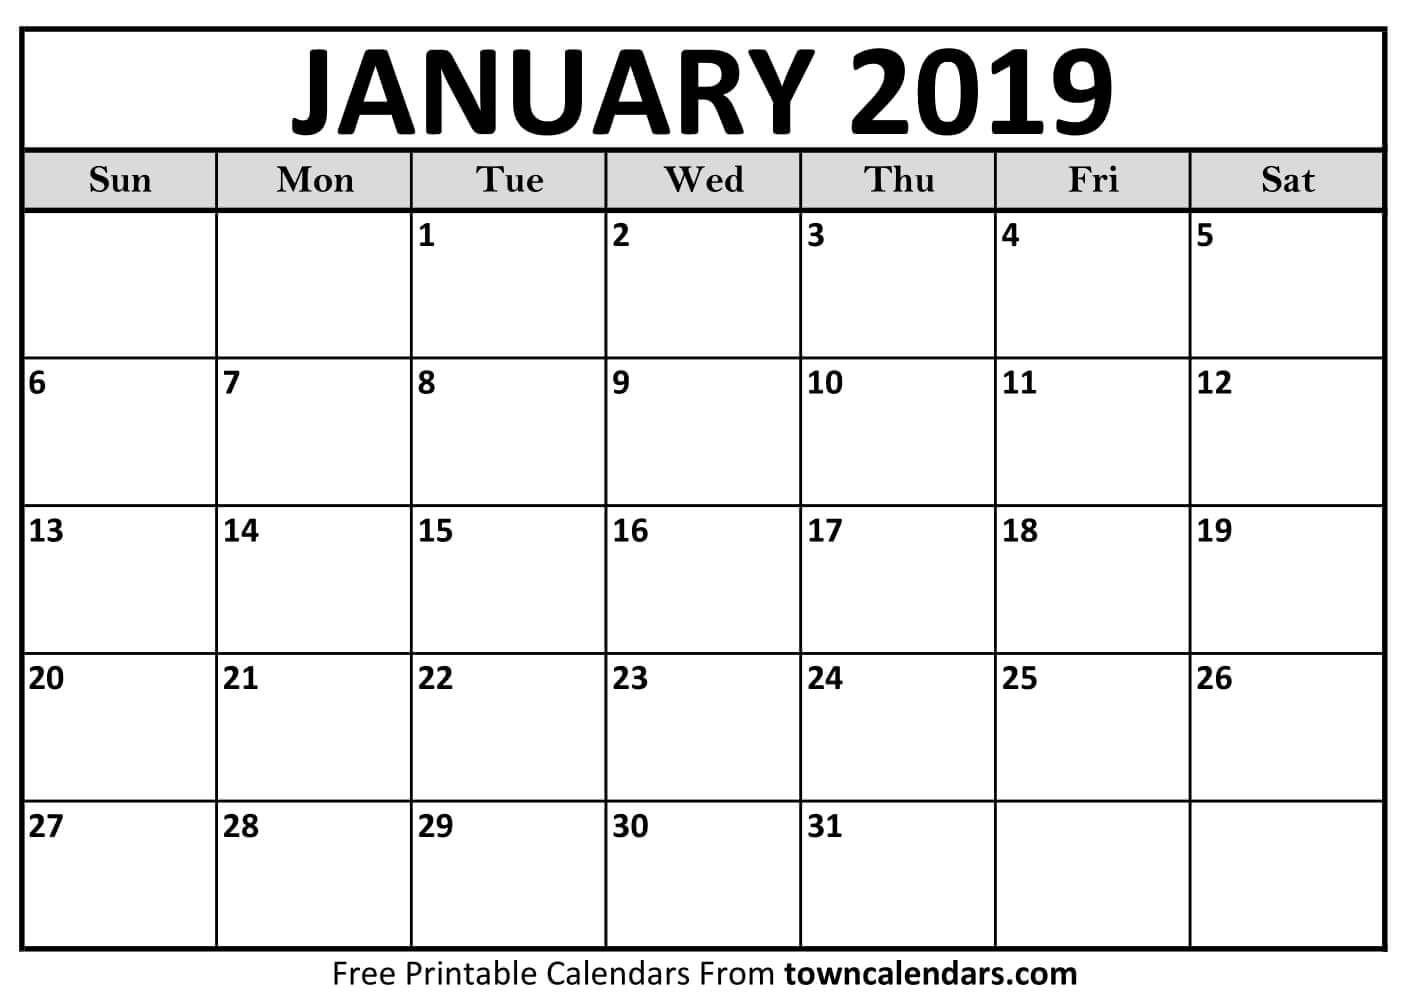 Printable January 2019 Calendar Free January 2019 Calendar